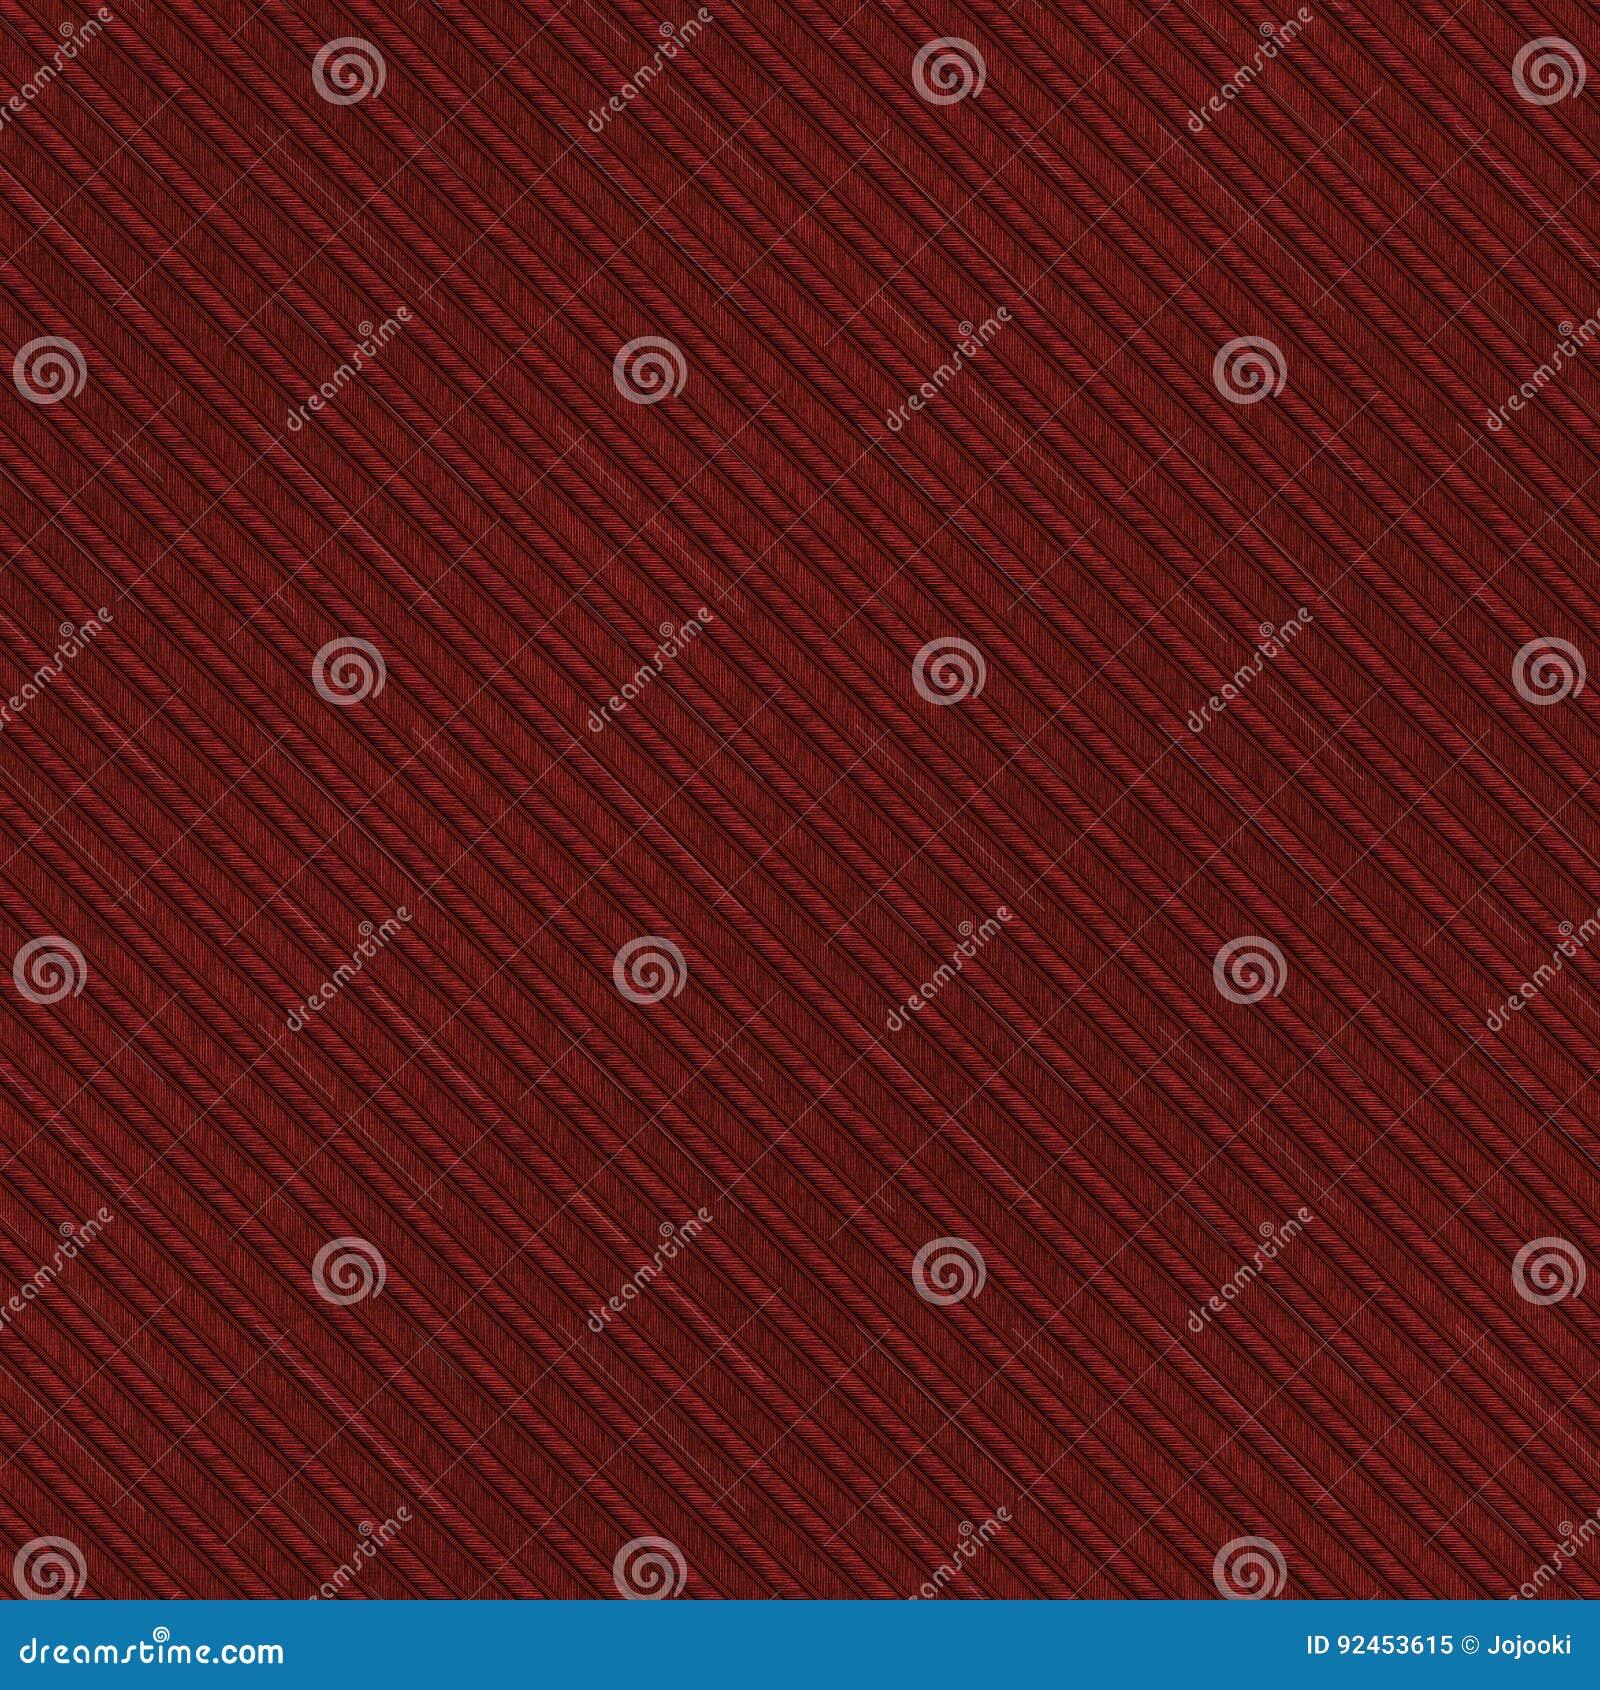 Embroidery Fabric Seamless Texture Stock Illustration Illustration